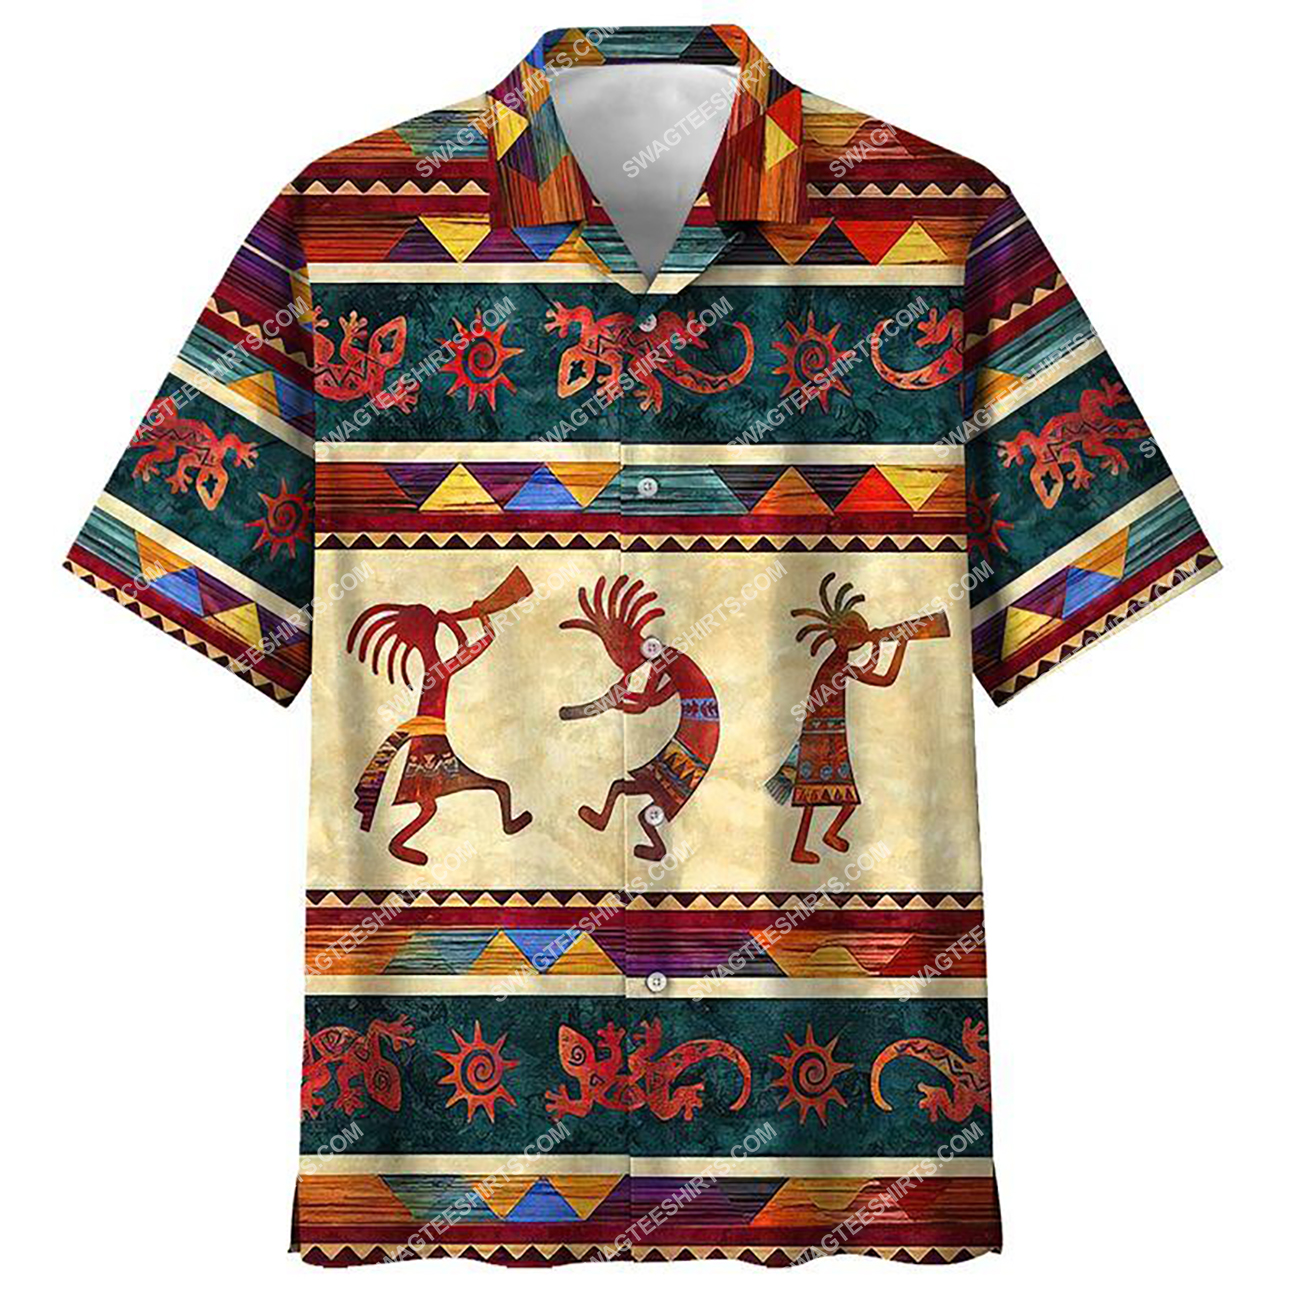 vintage native american culture all over printed hawaiian shirt 1(1) - Copy